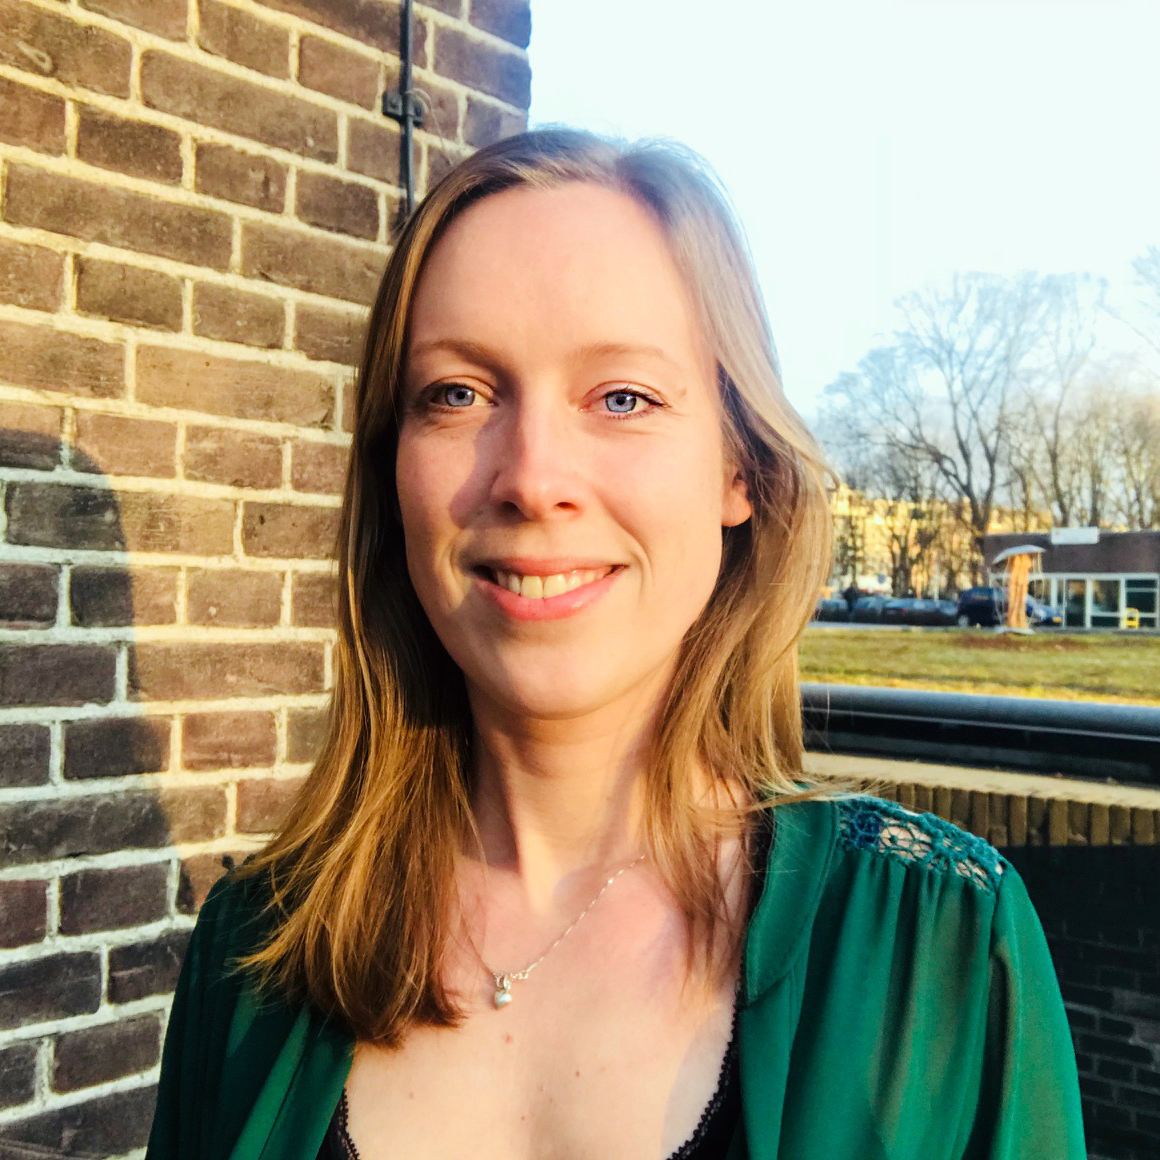 Lajla Brinkhoff - Online Marketeer :: Team PerfectXL